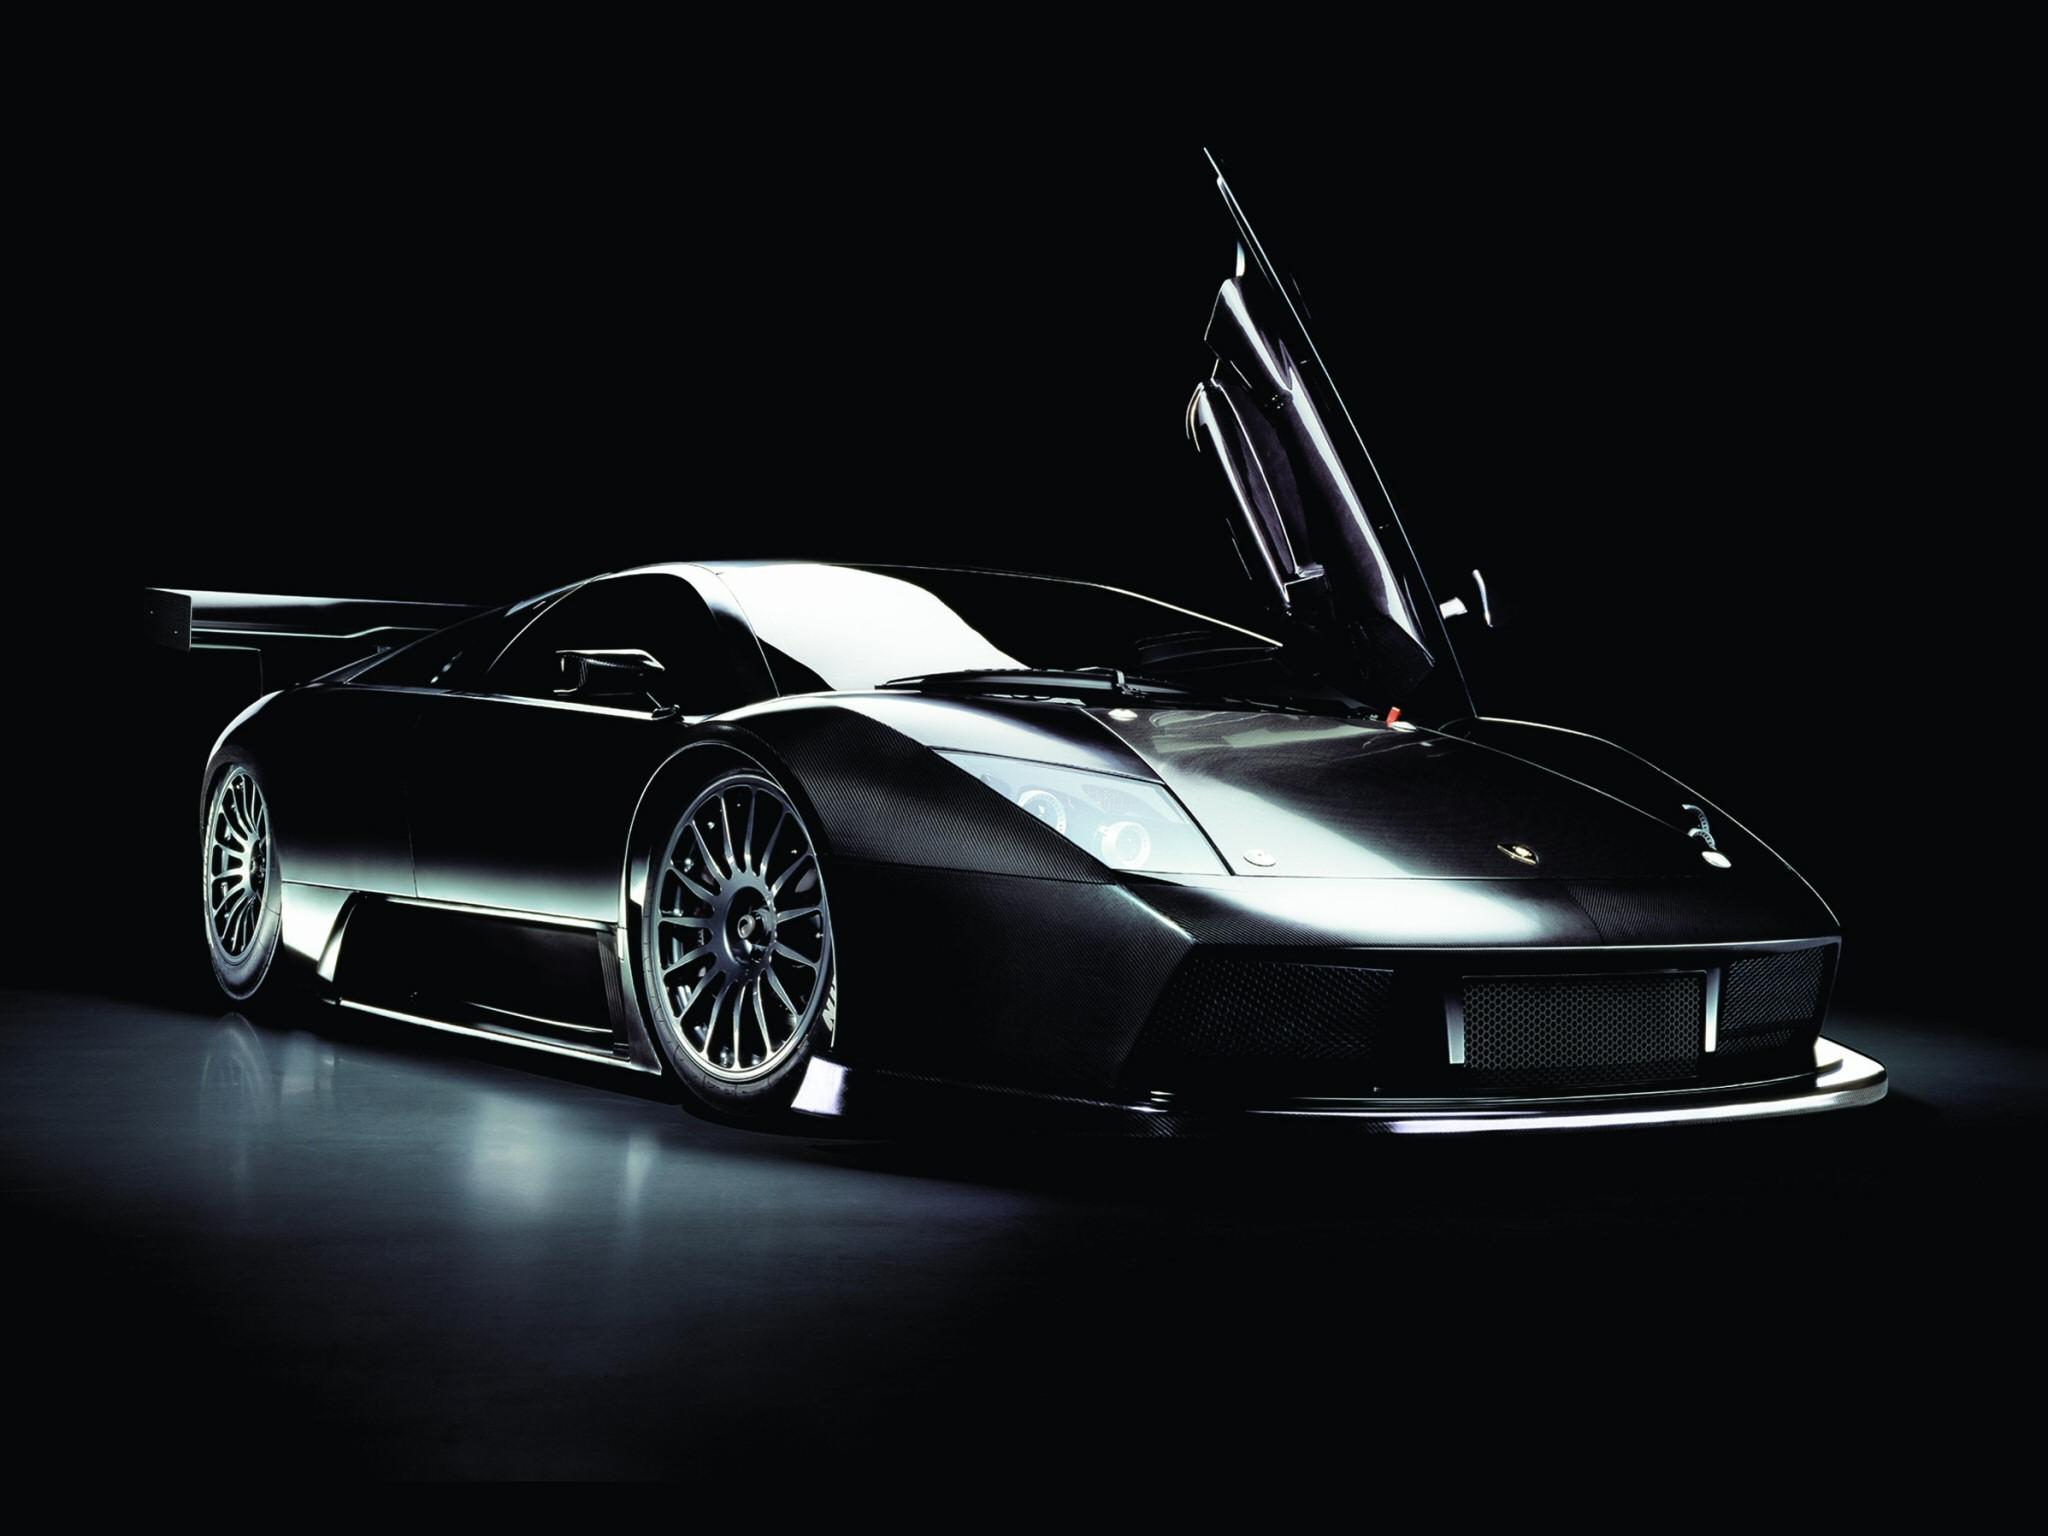 Cars, Sports, Lamborghini, Vehicles, Supercars, Black Background   Free  Wallpaper / WallpaperJam.com